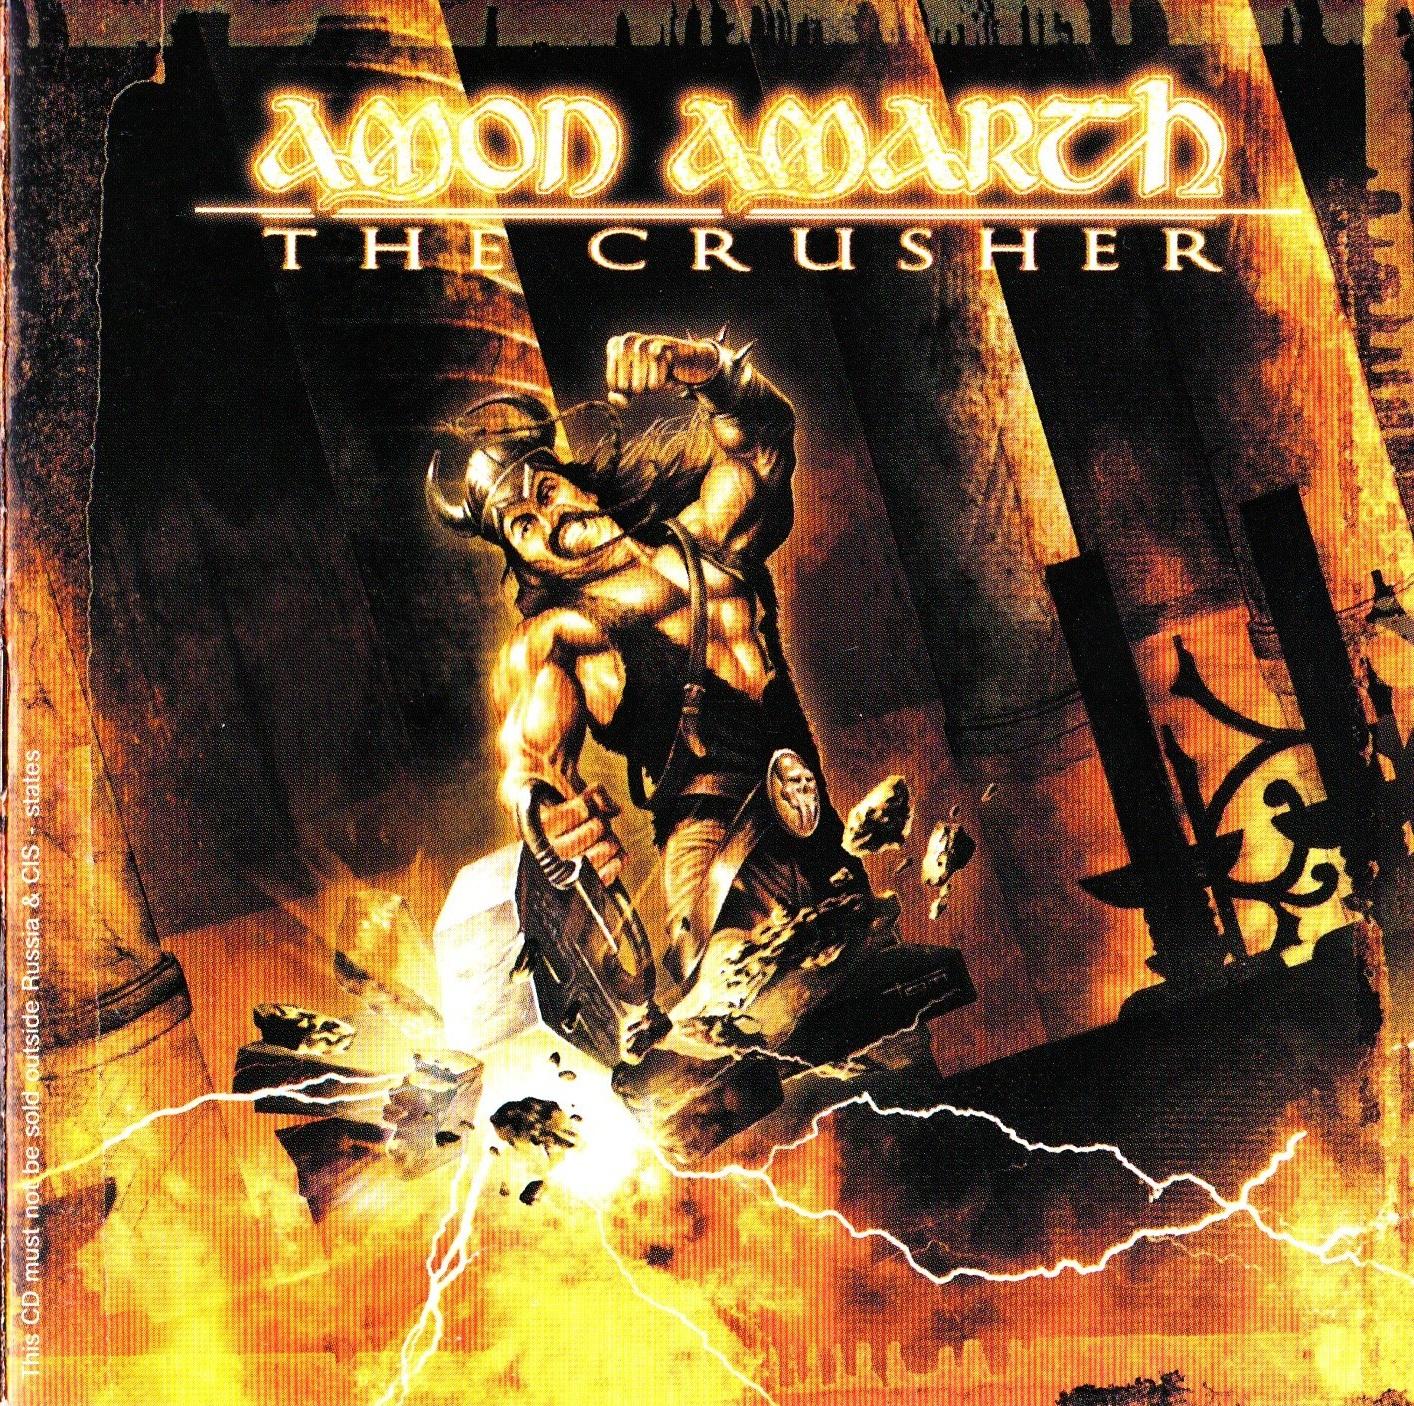 Amon Amarth — The Crusher (2001)